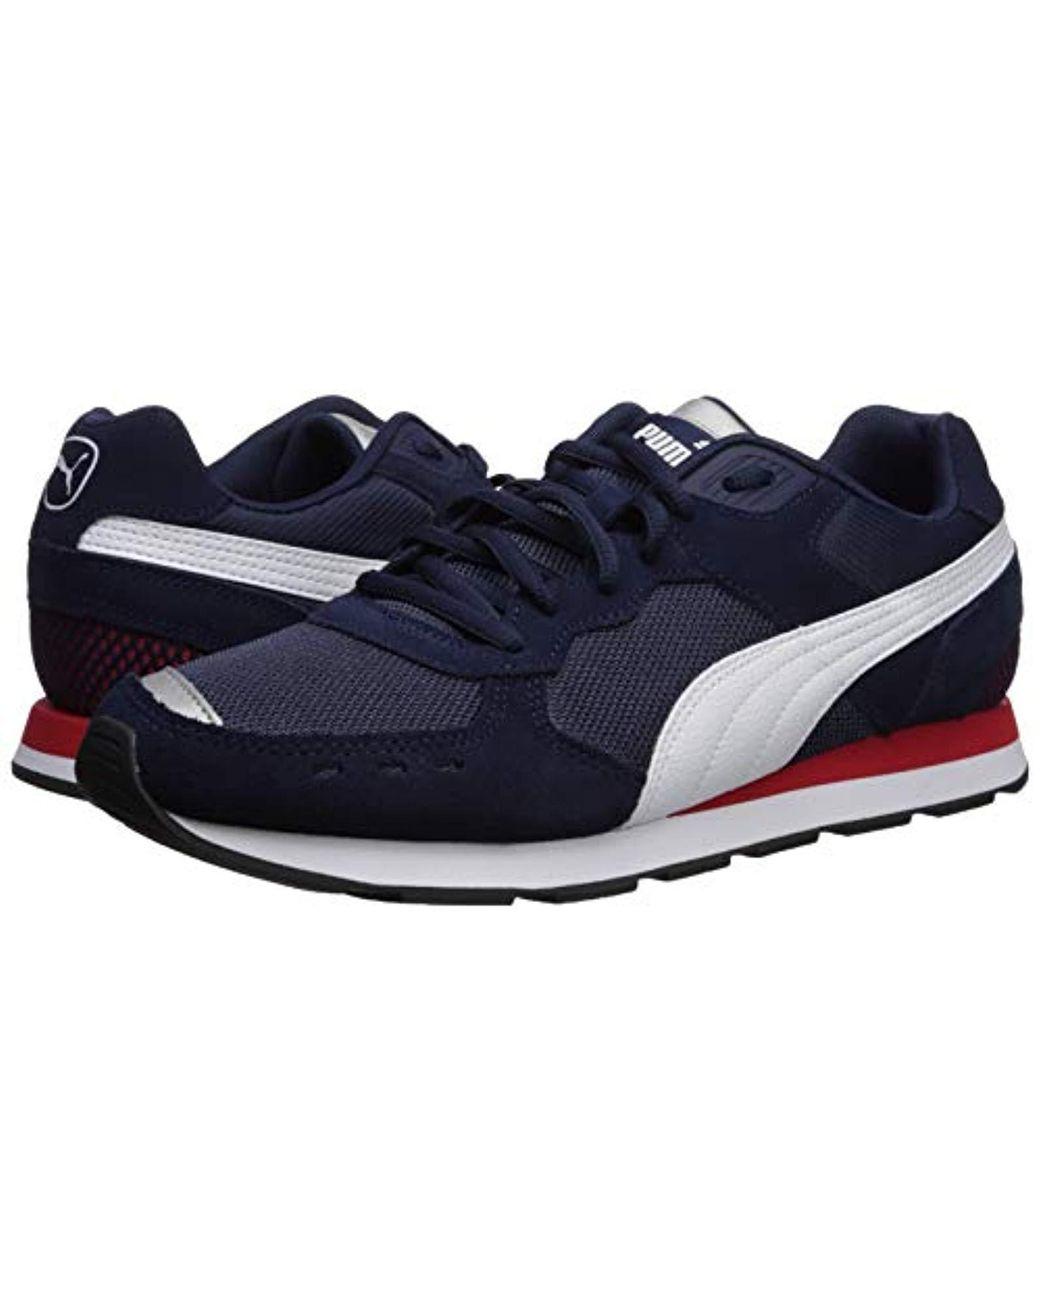 1300 Best puma images   Pumas shoes, Me too shoes, Puma outfit